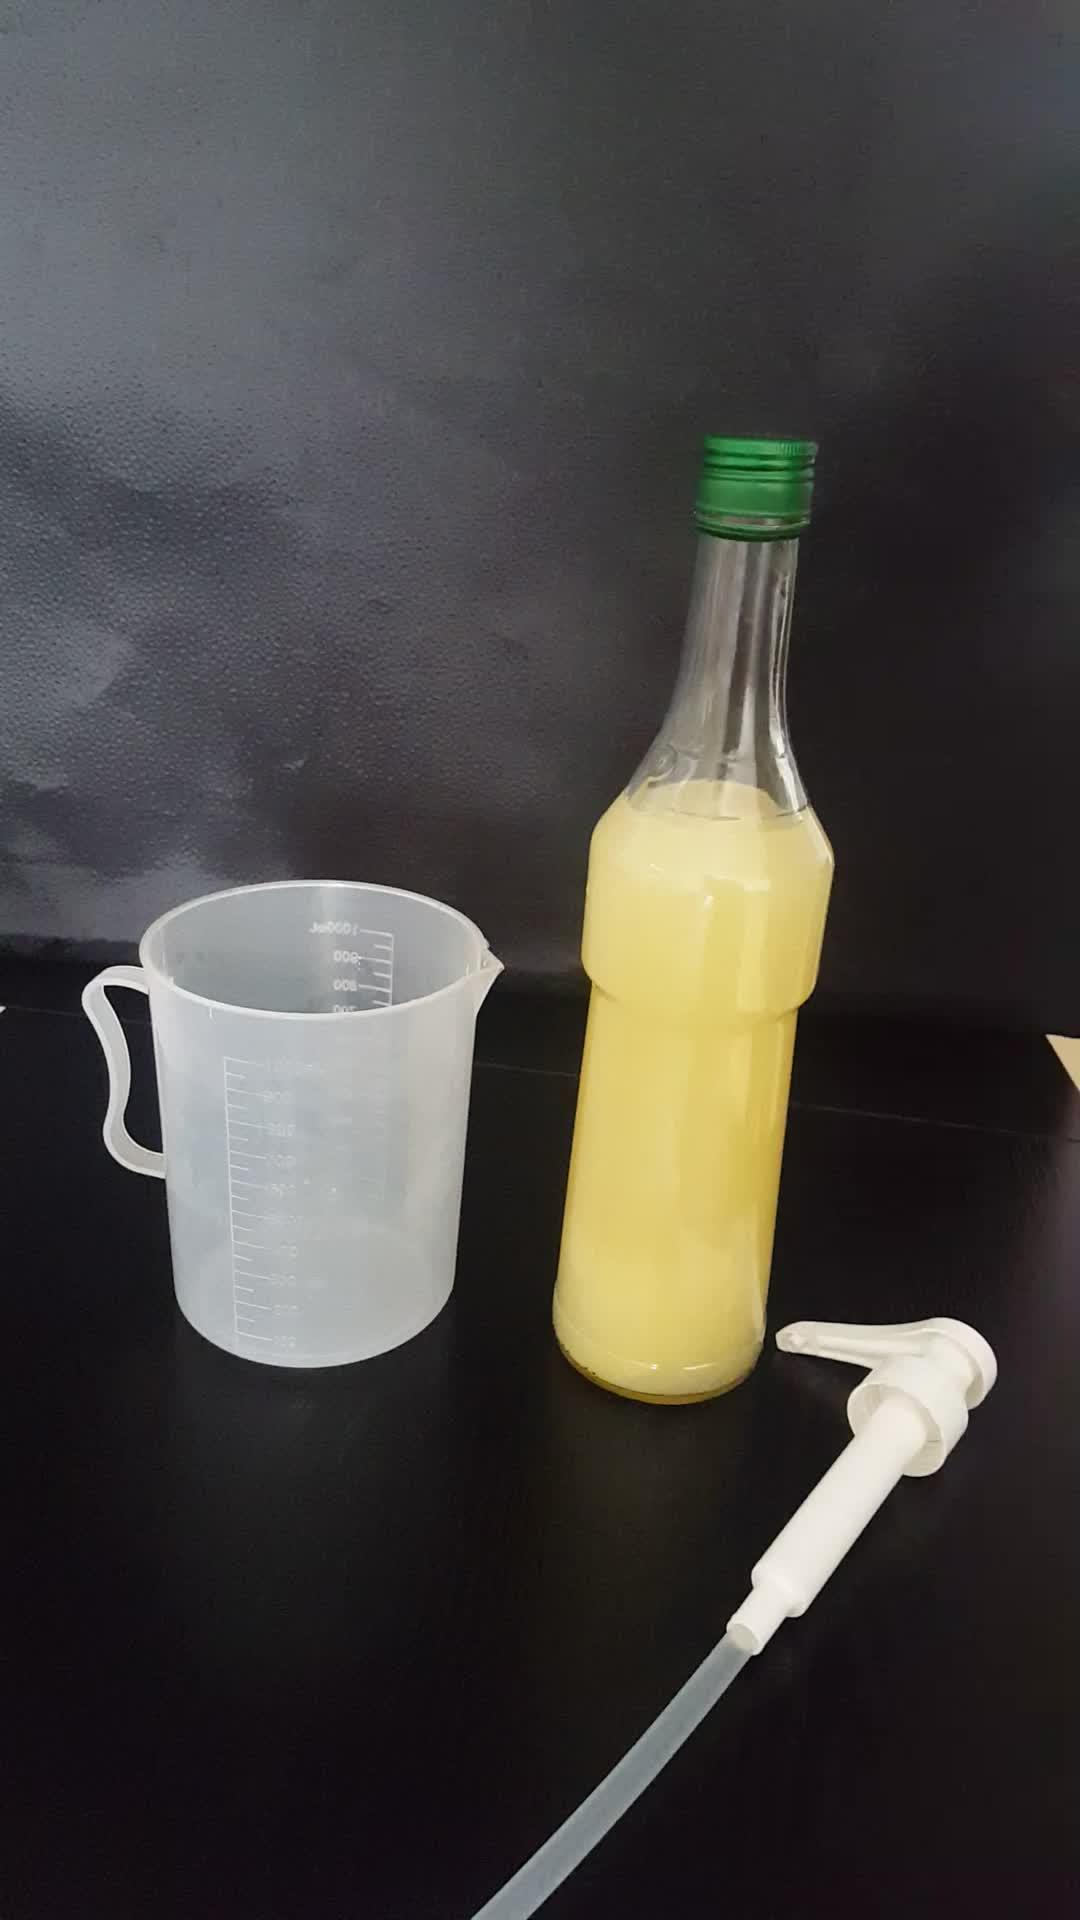 42/410 de plástico de calidad alimentaria 8cc/10cc botella de jarabe de kepchup salsa bebidas de jugo de galón de bomba de dispensador de